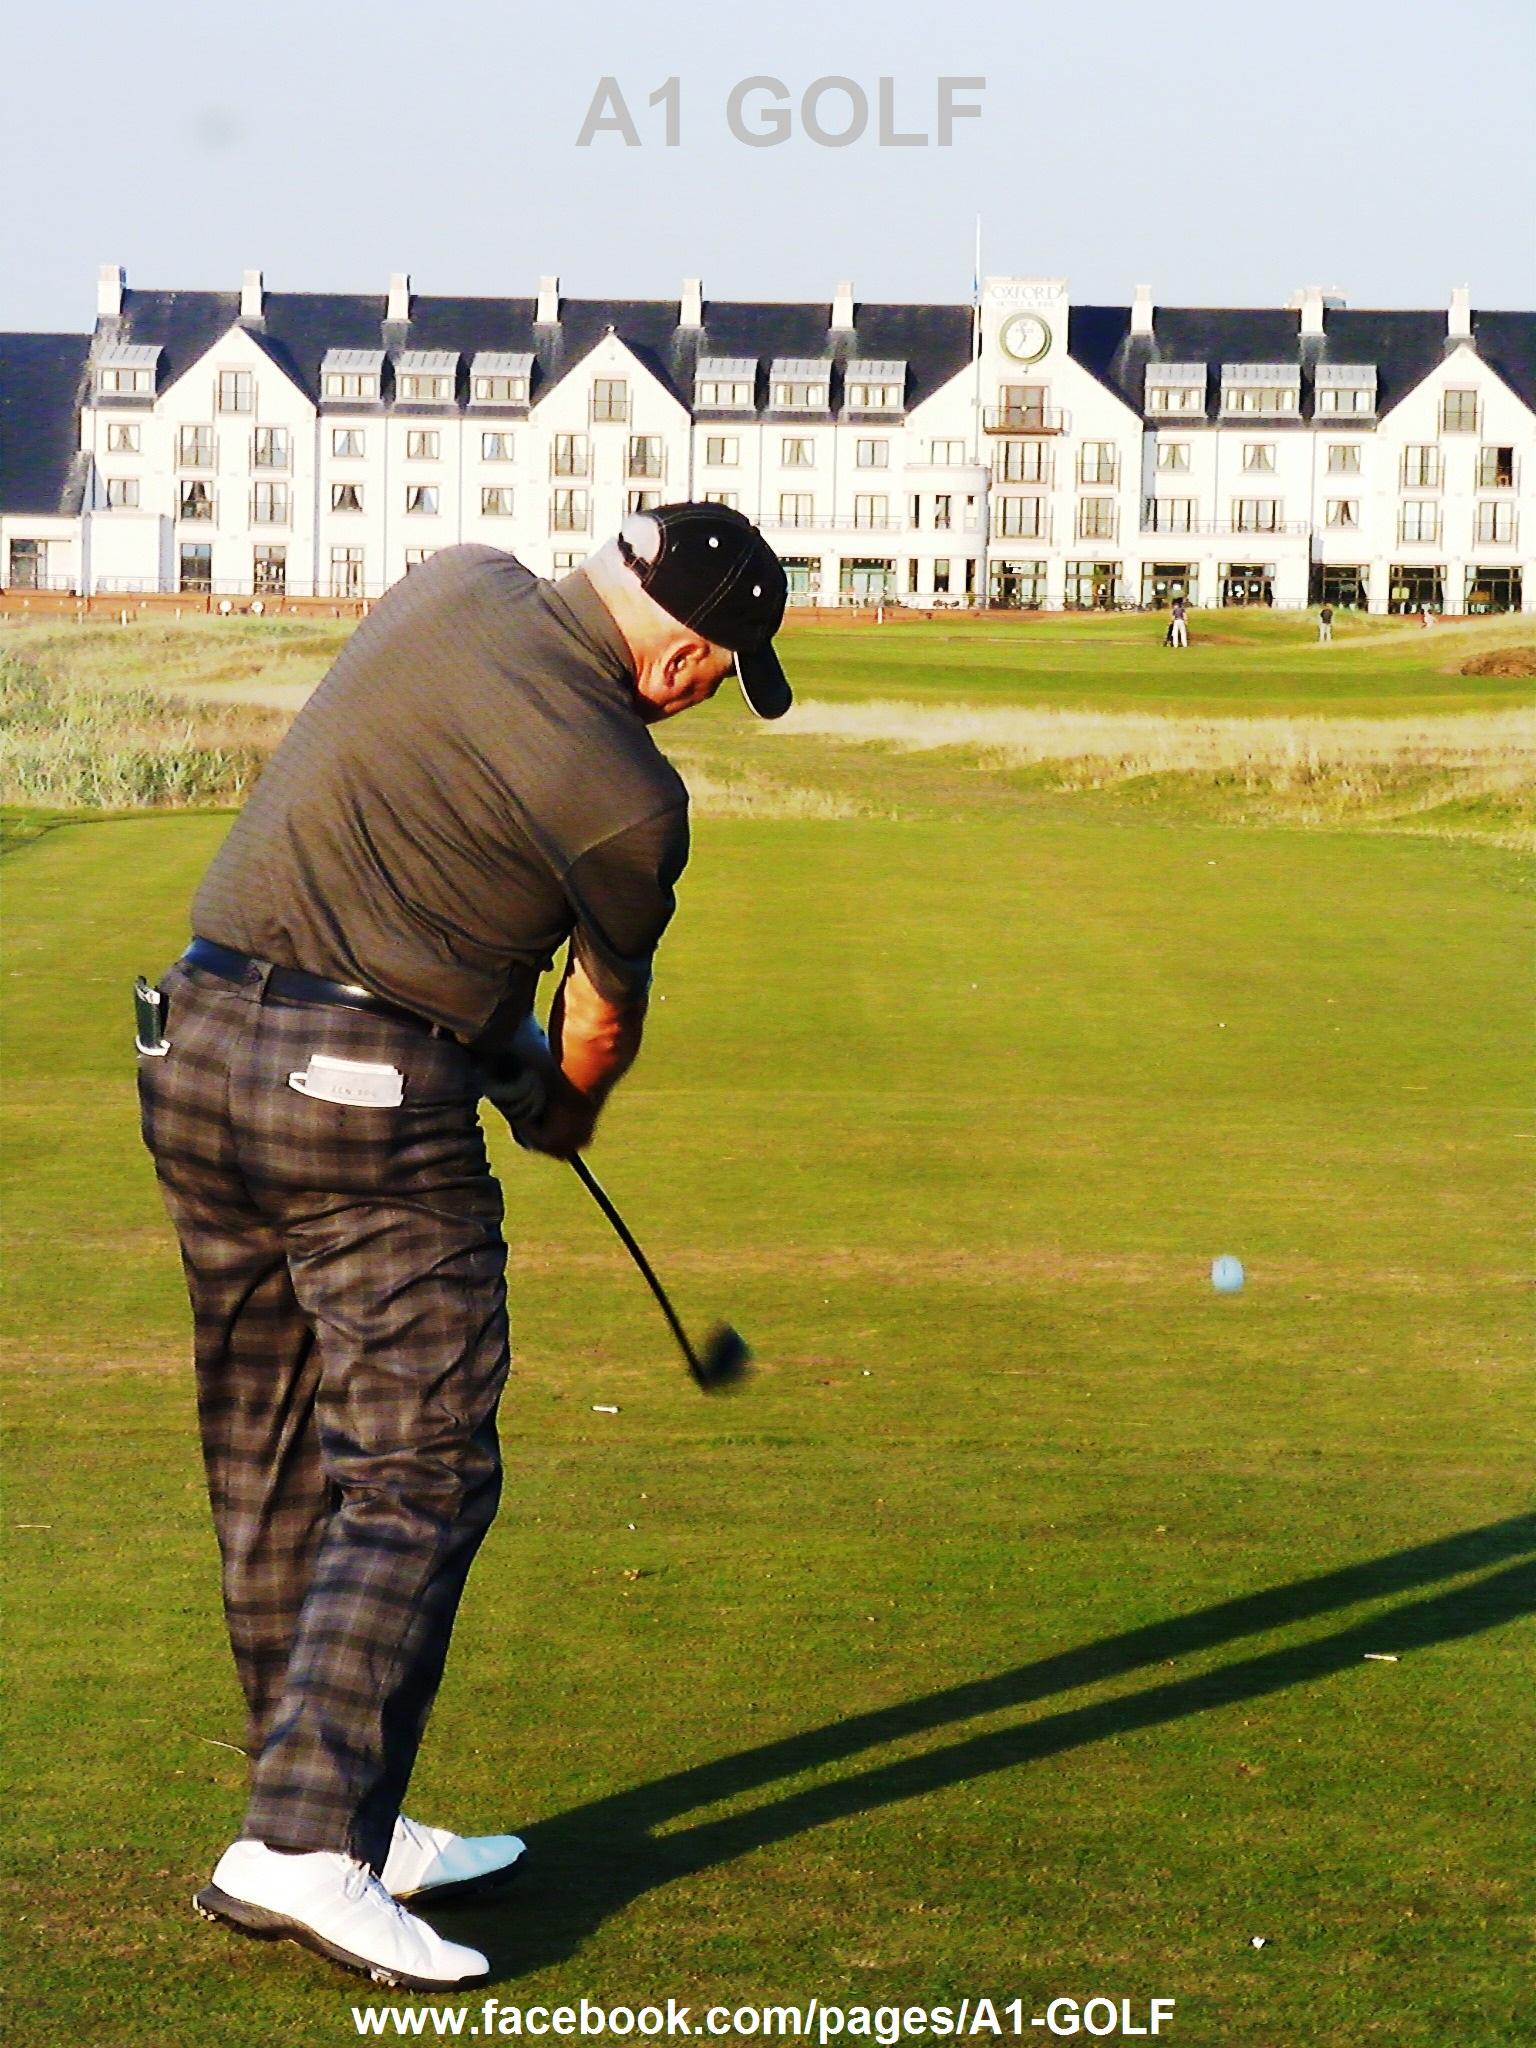 Avatar of golfer named Gordon Cree